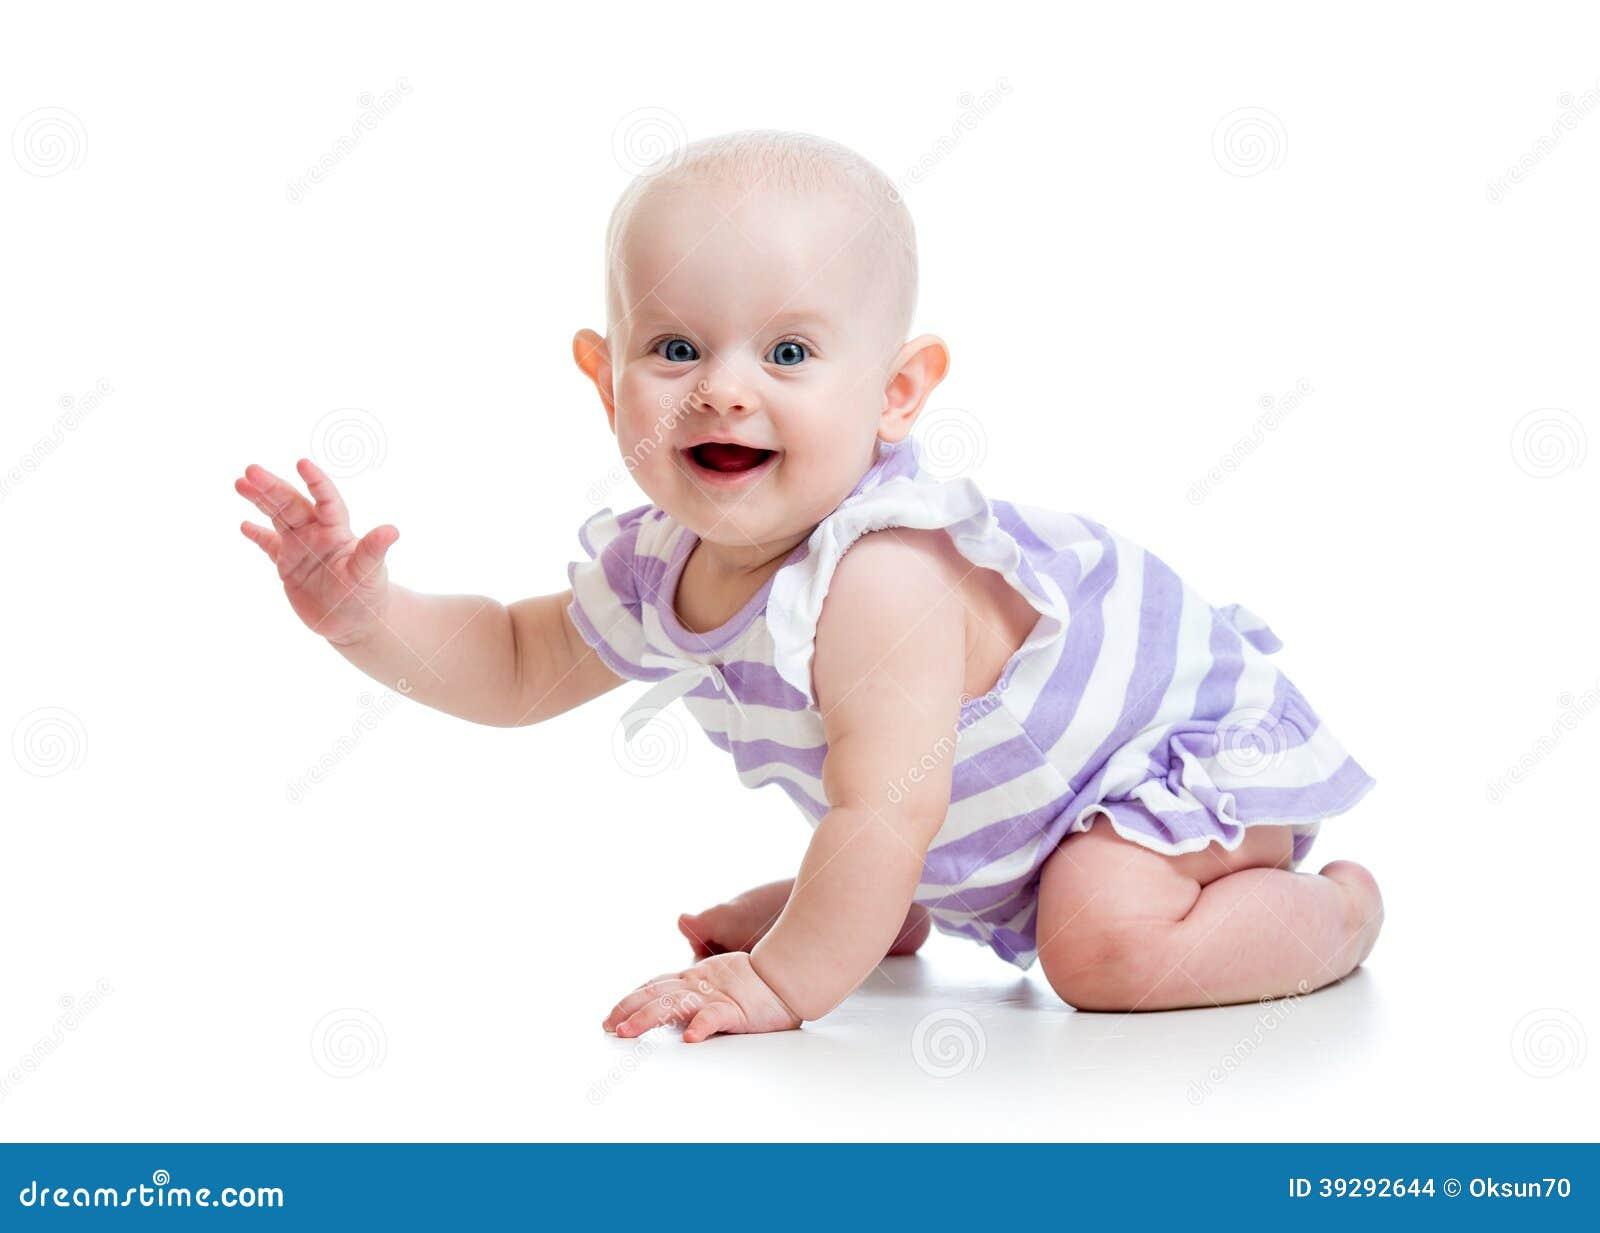 Funny Baby Girl Stock Photo - Image: 39292644 Funny Baby Girl